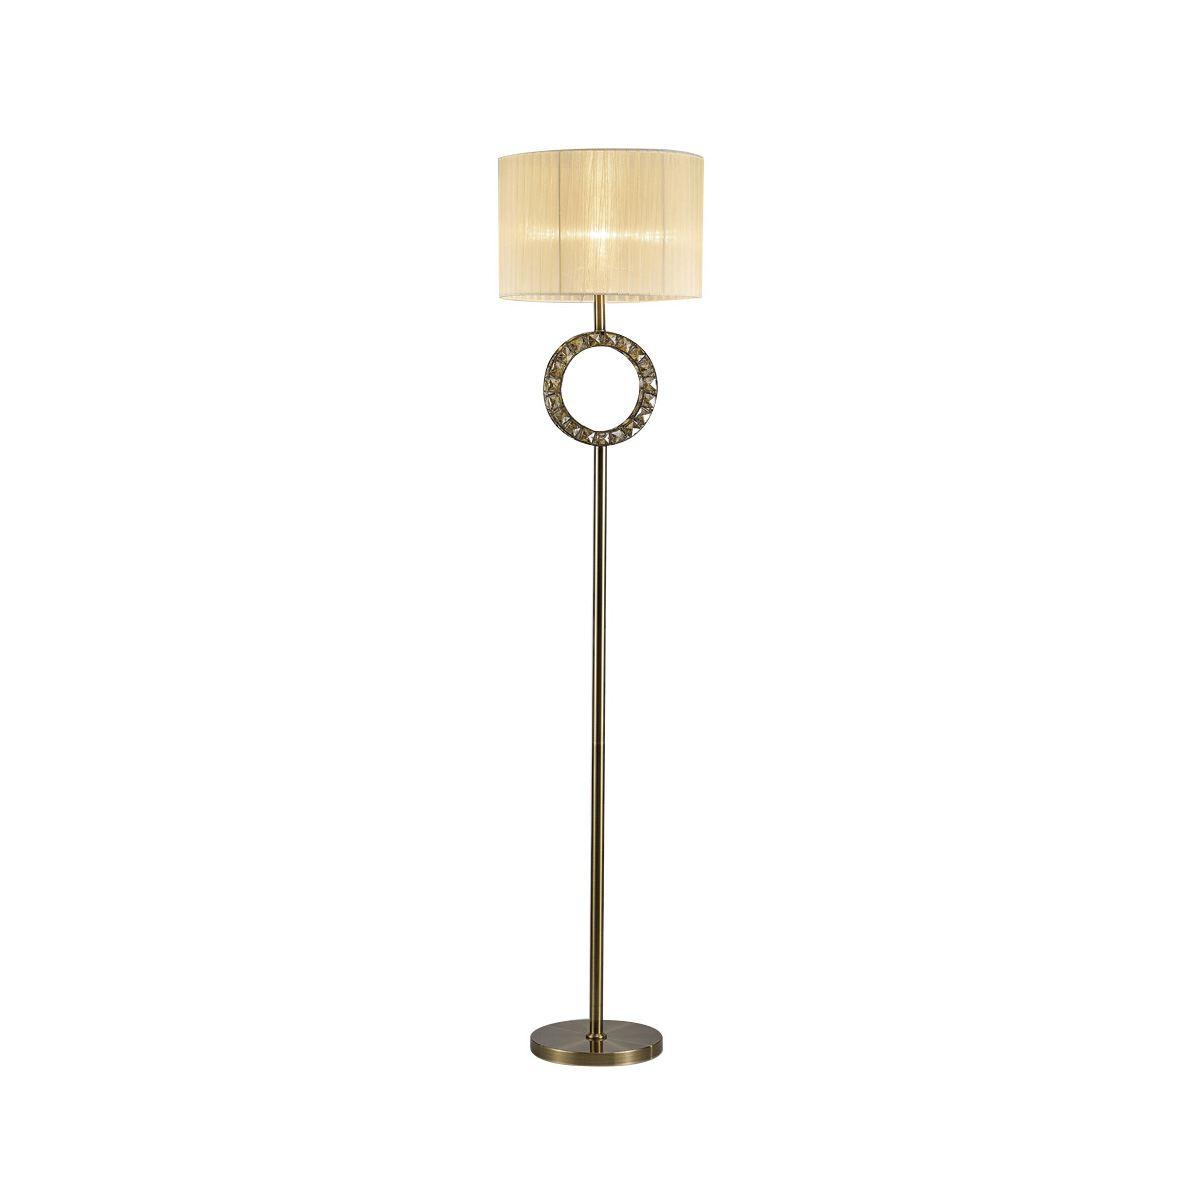 Diyas Florence Round Floor Lamp With Cream Shade 1 Light Antique Brass/Crystal